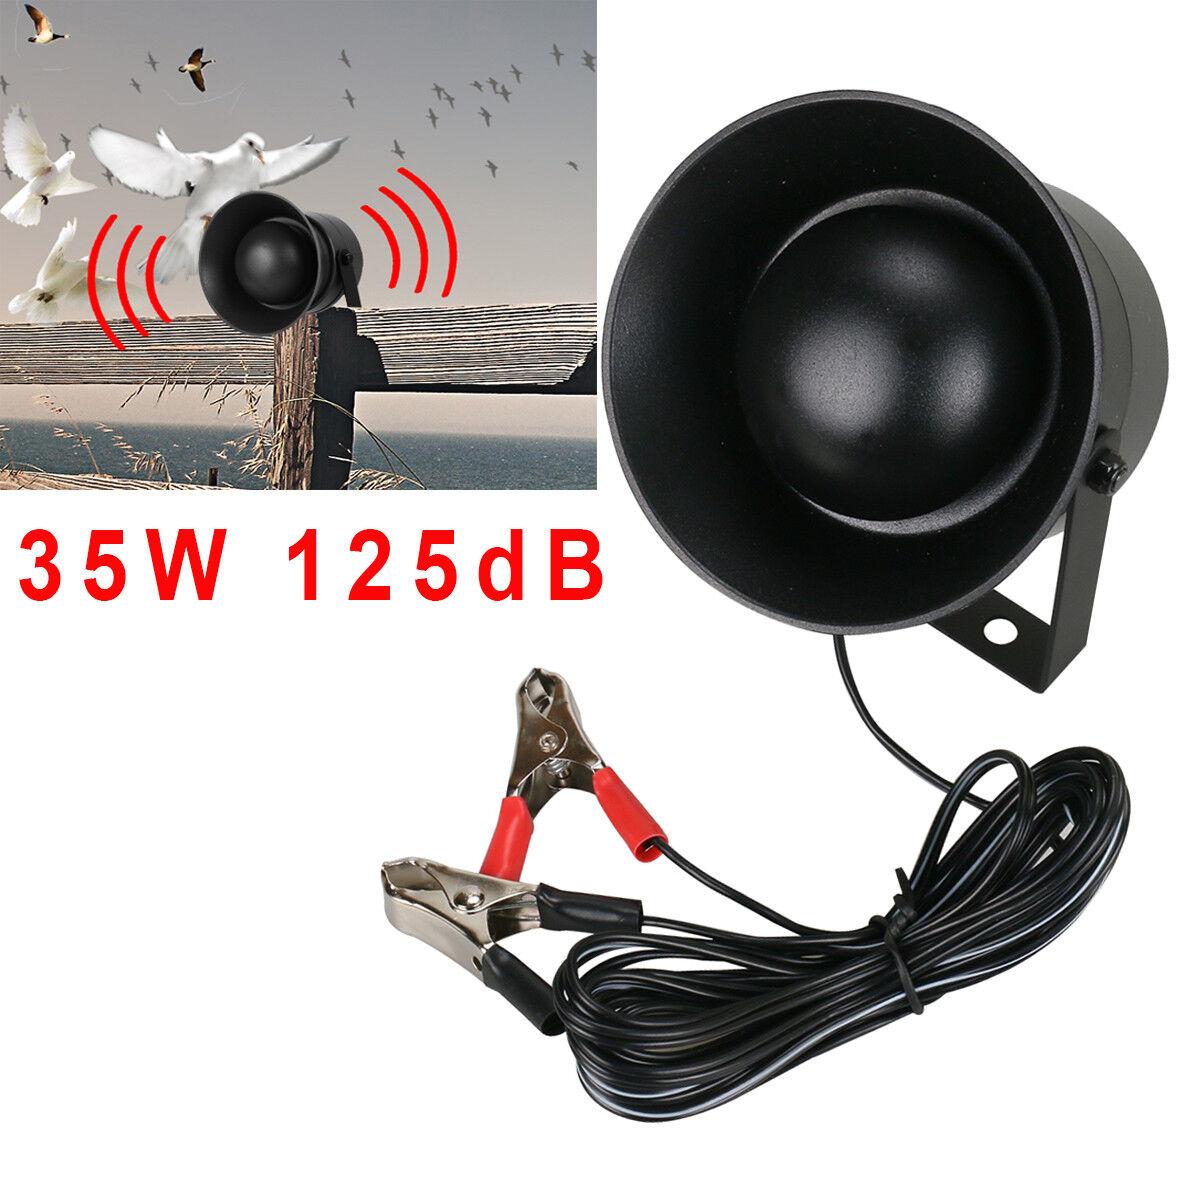 35W 125dB Outdoor MP3 Player Hunting Bird Decoy LED Flashlight Bird Caller